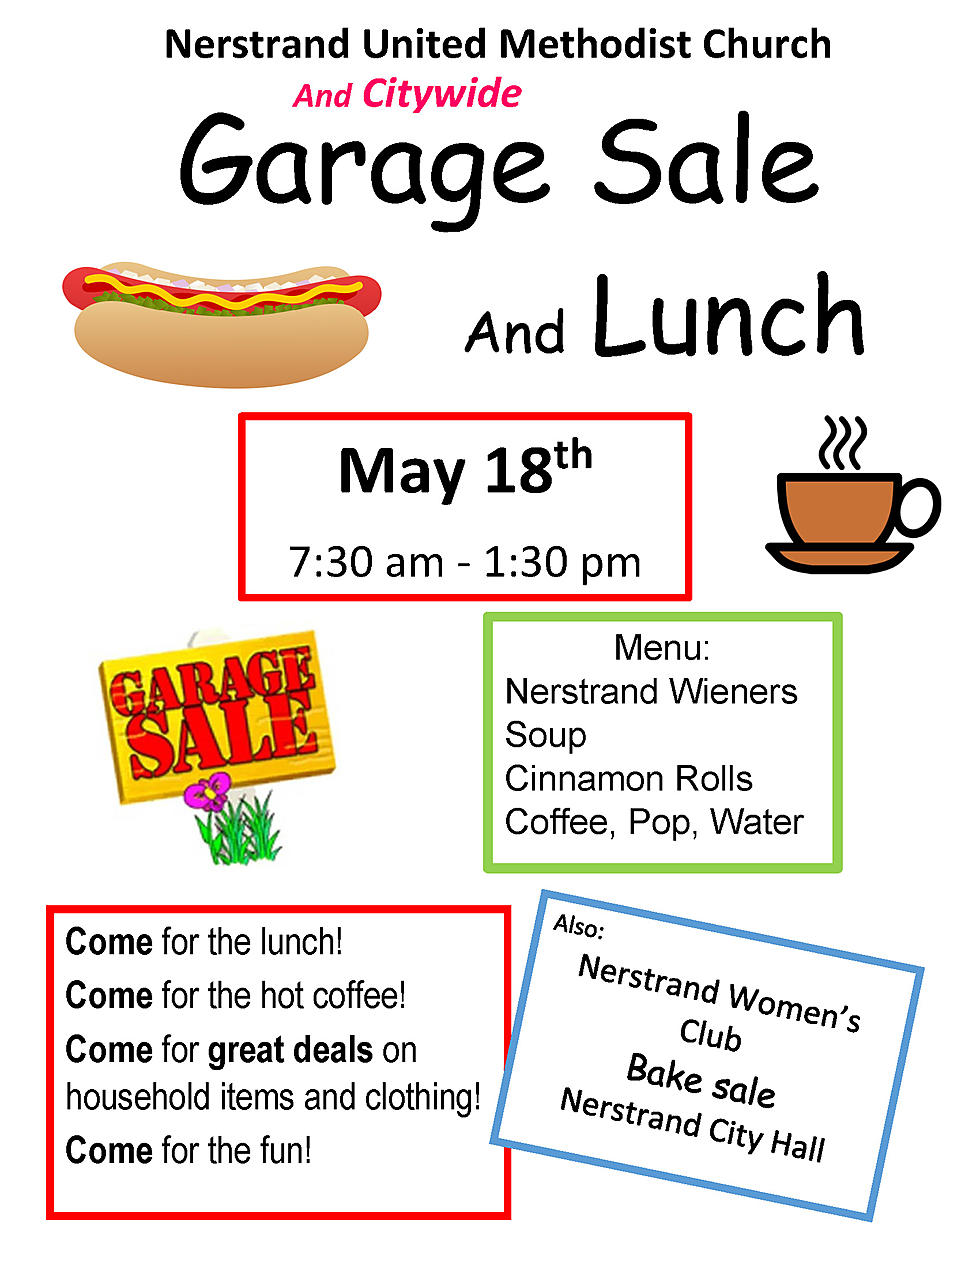 Nerstrand United Methodist Church Garage Sale And Lunch